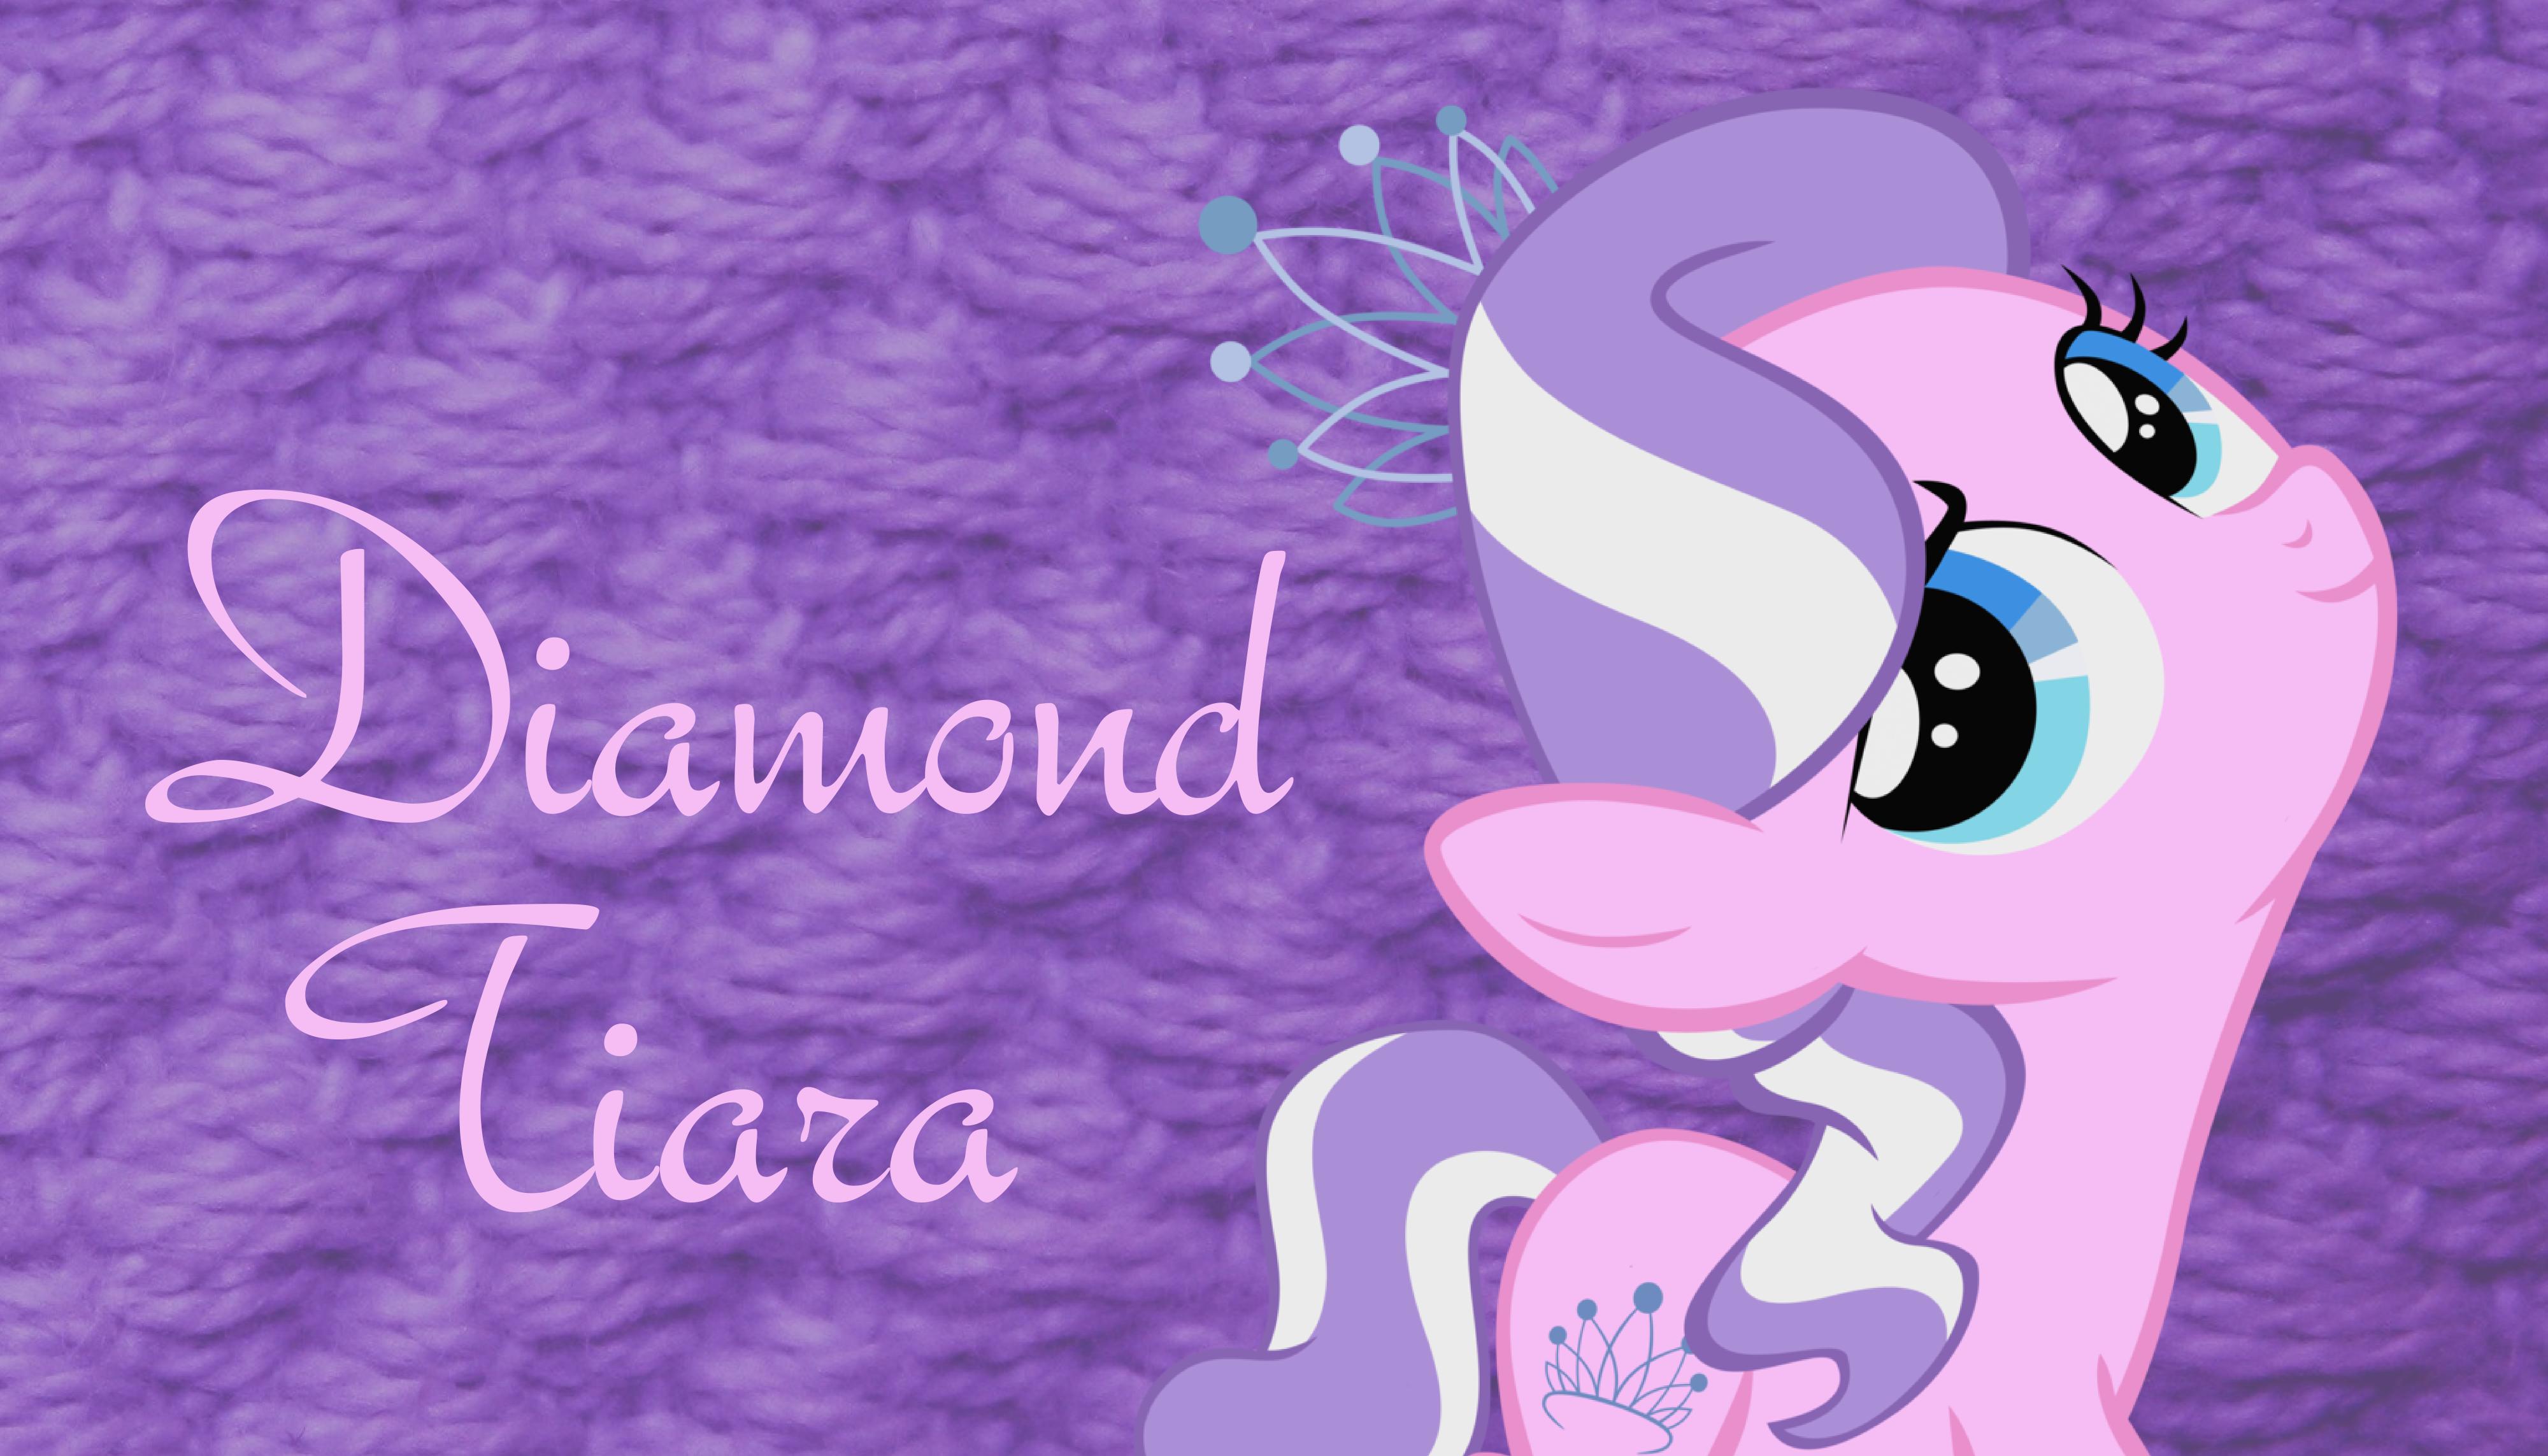 Diamond Tiara Background by MetaTiara